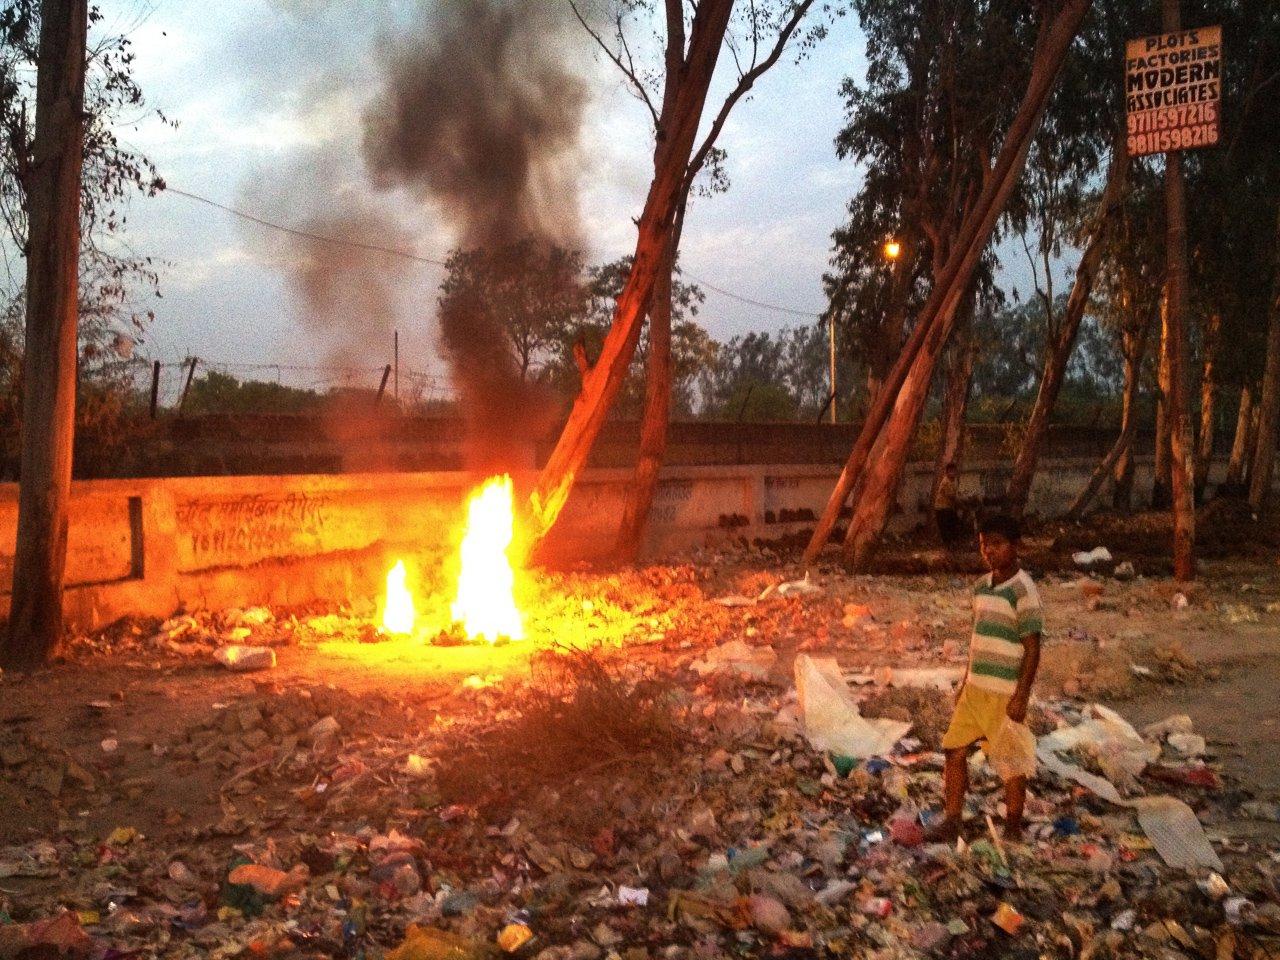 India_pollution_photos_body_6.jpg